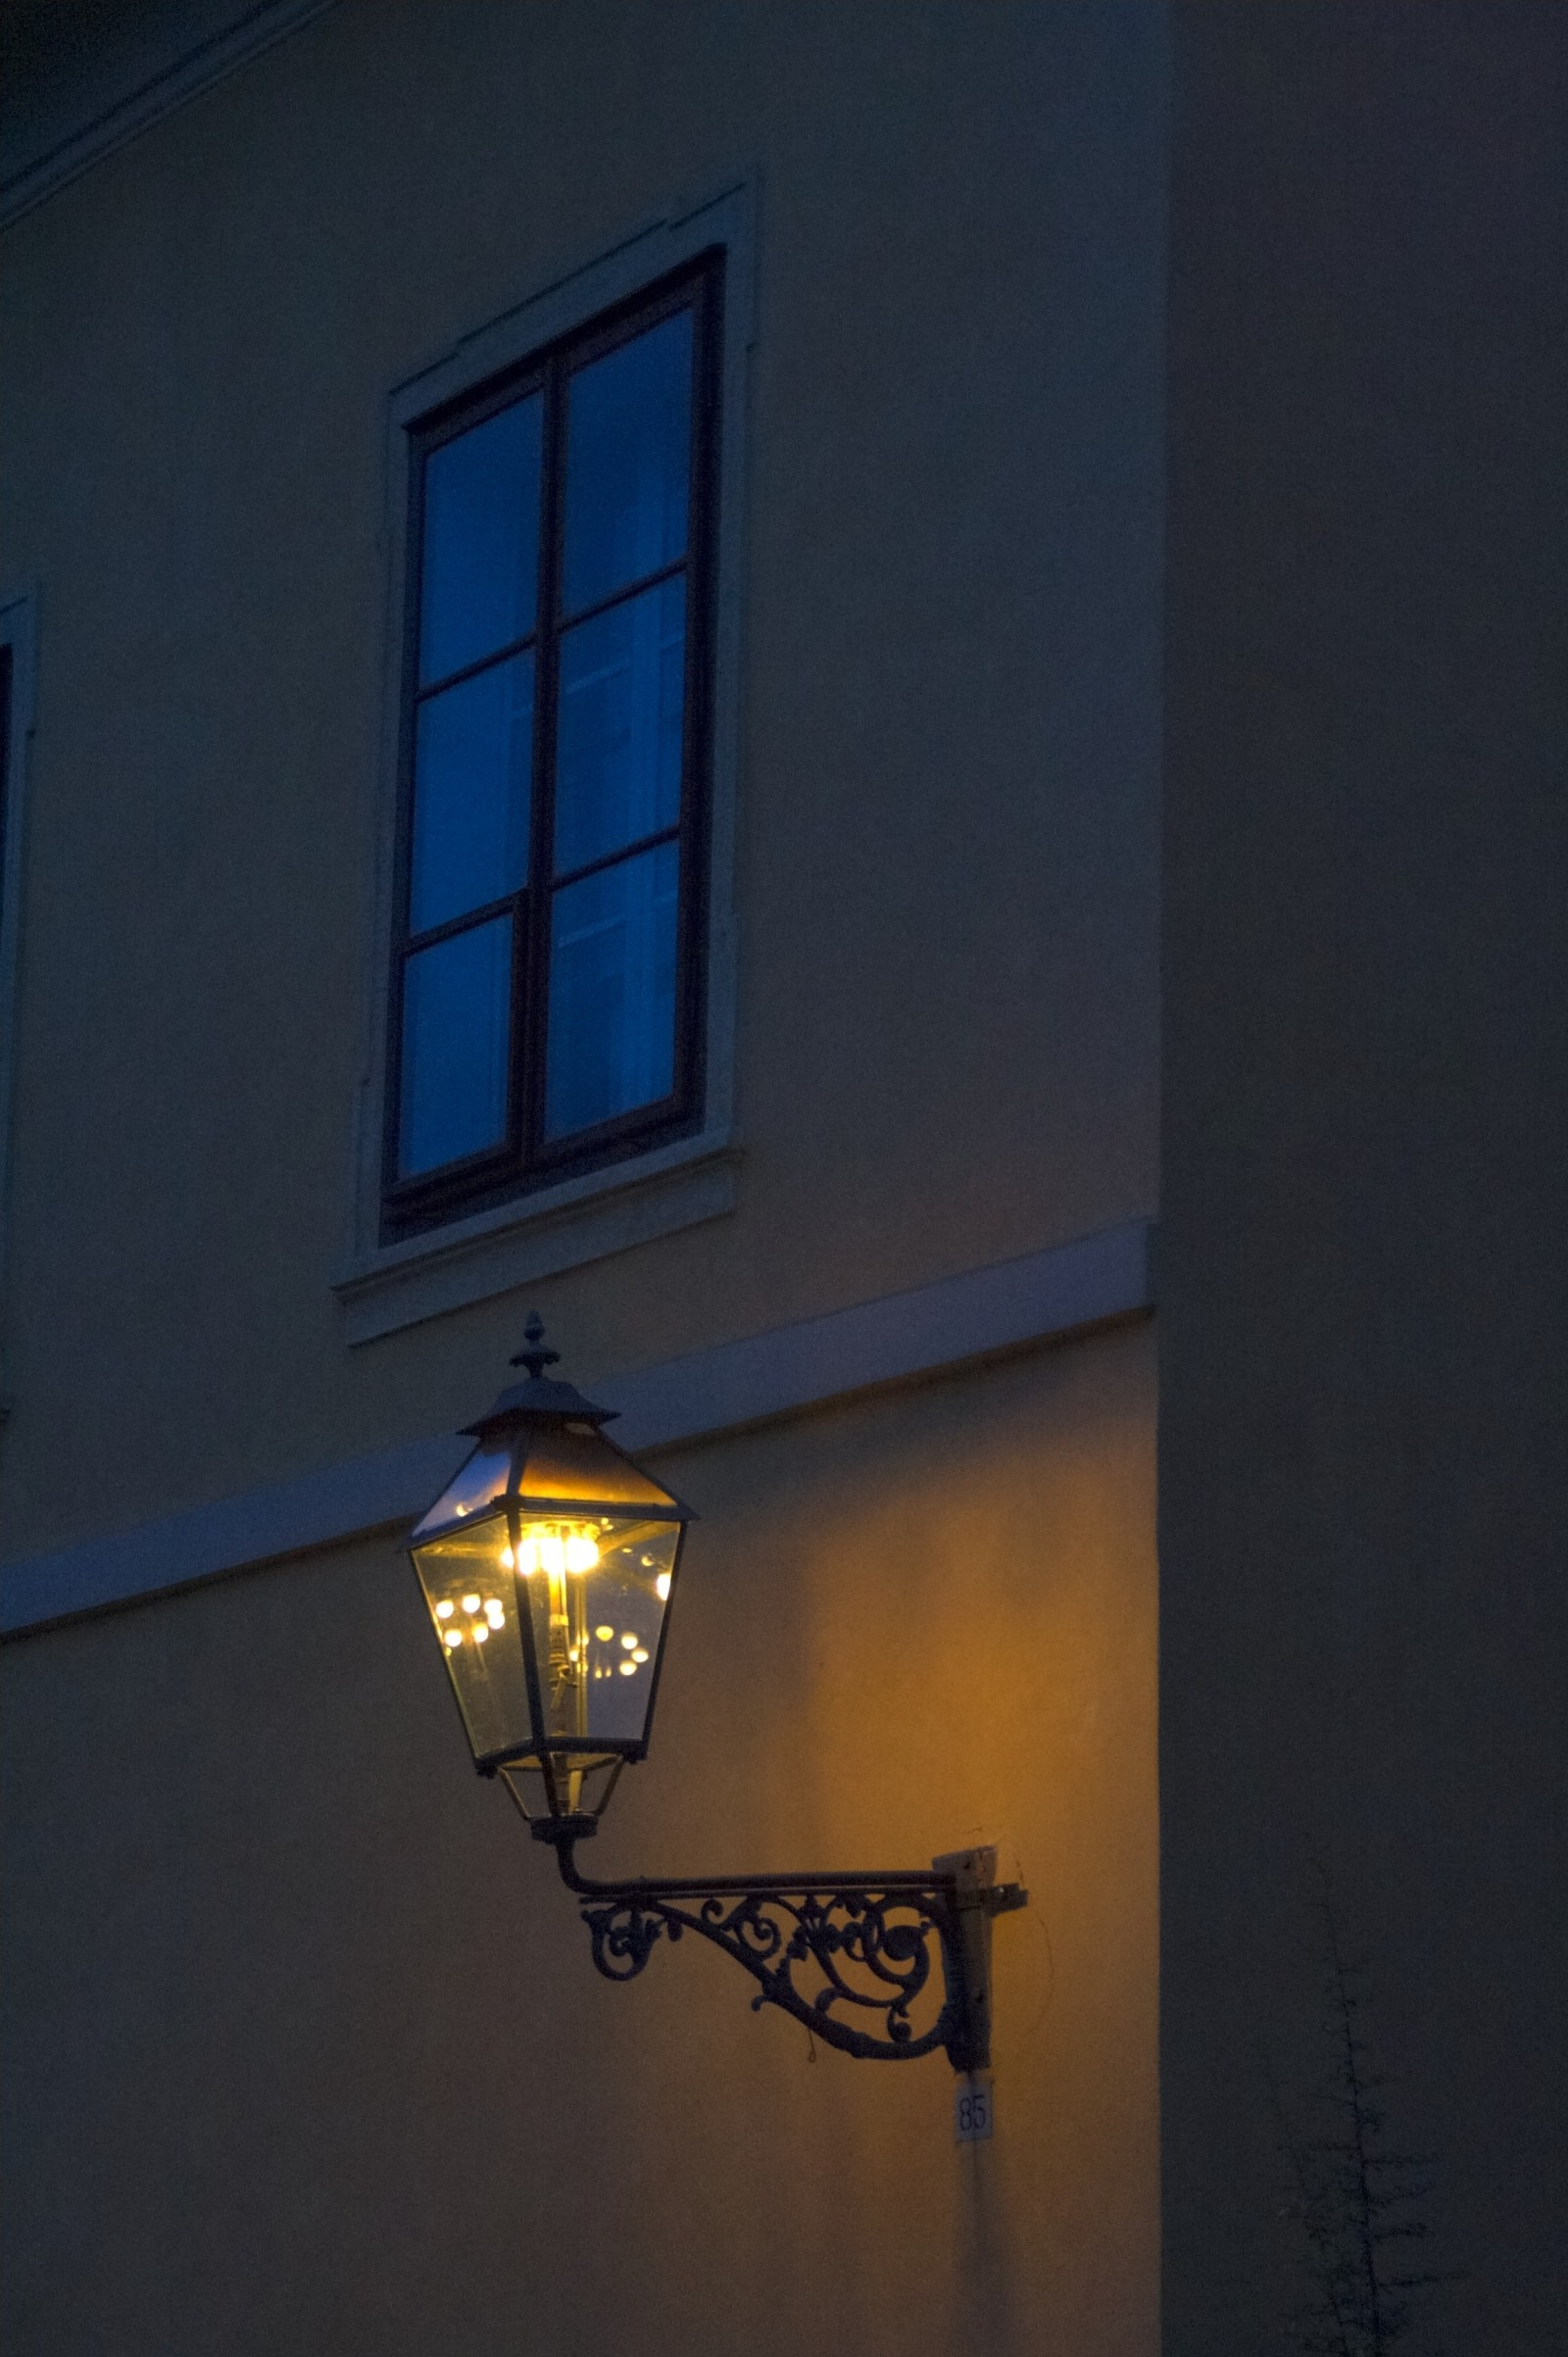 lantern-old-light-evening-twilight